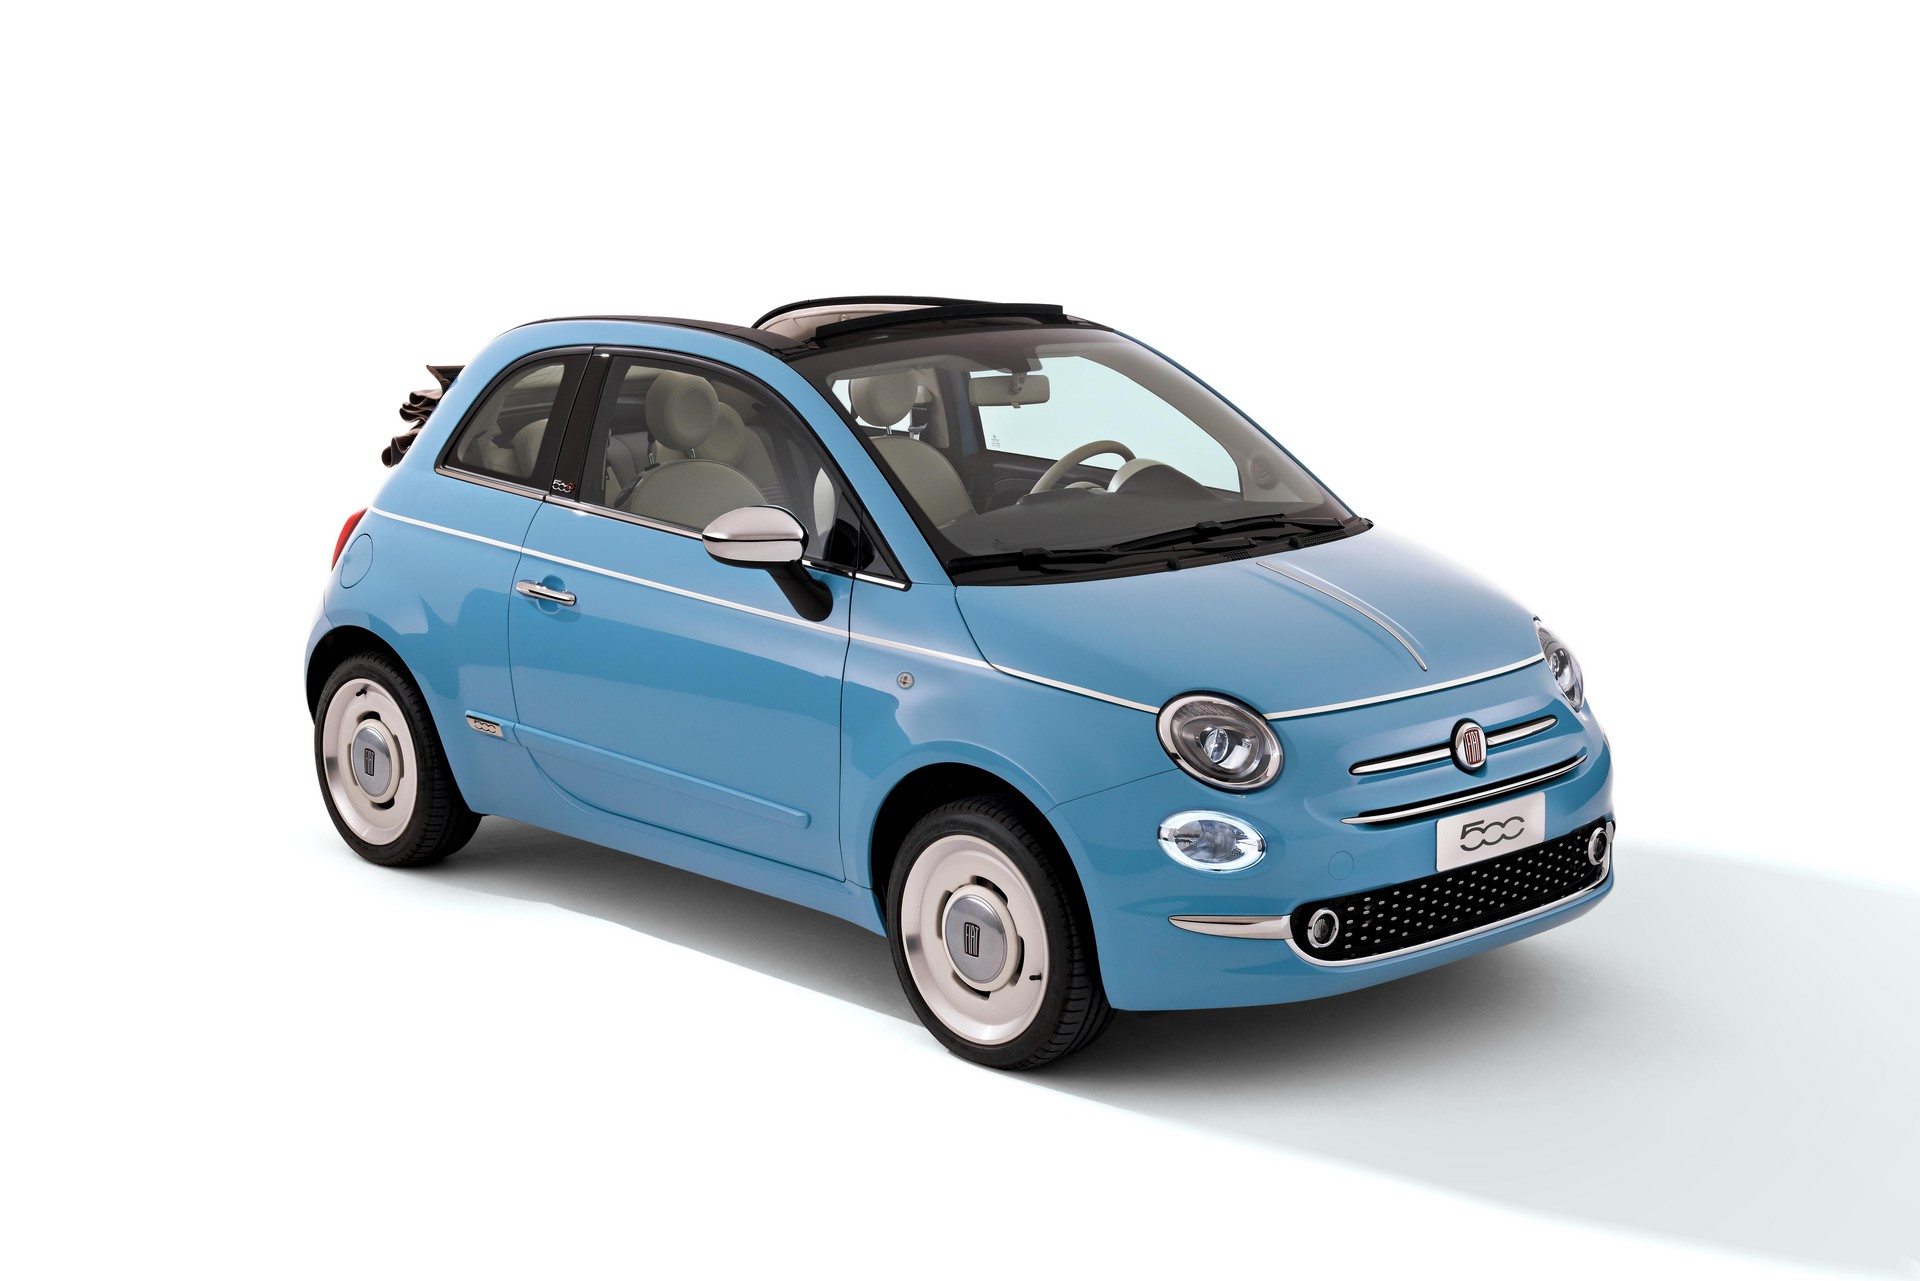 180704_Fiat_500-Spiaggina-58_14